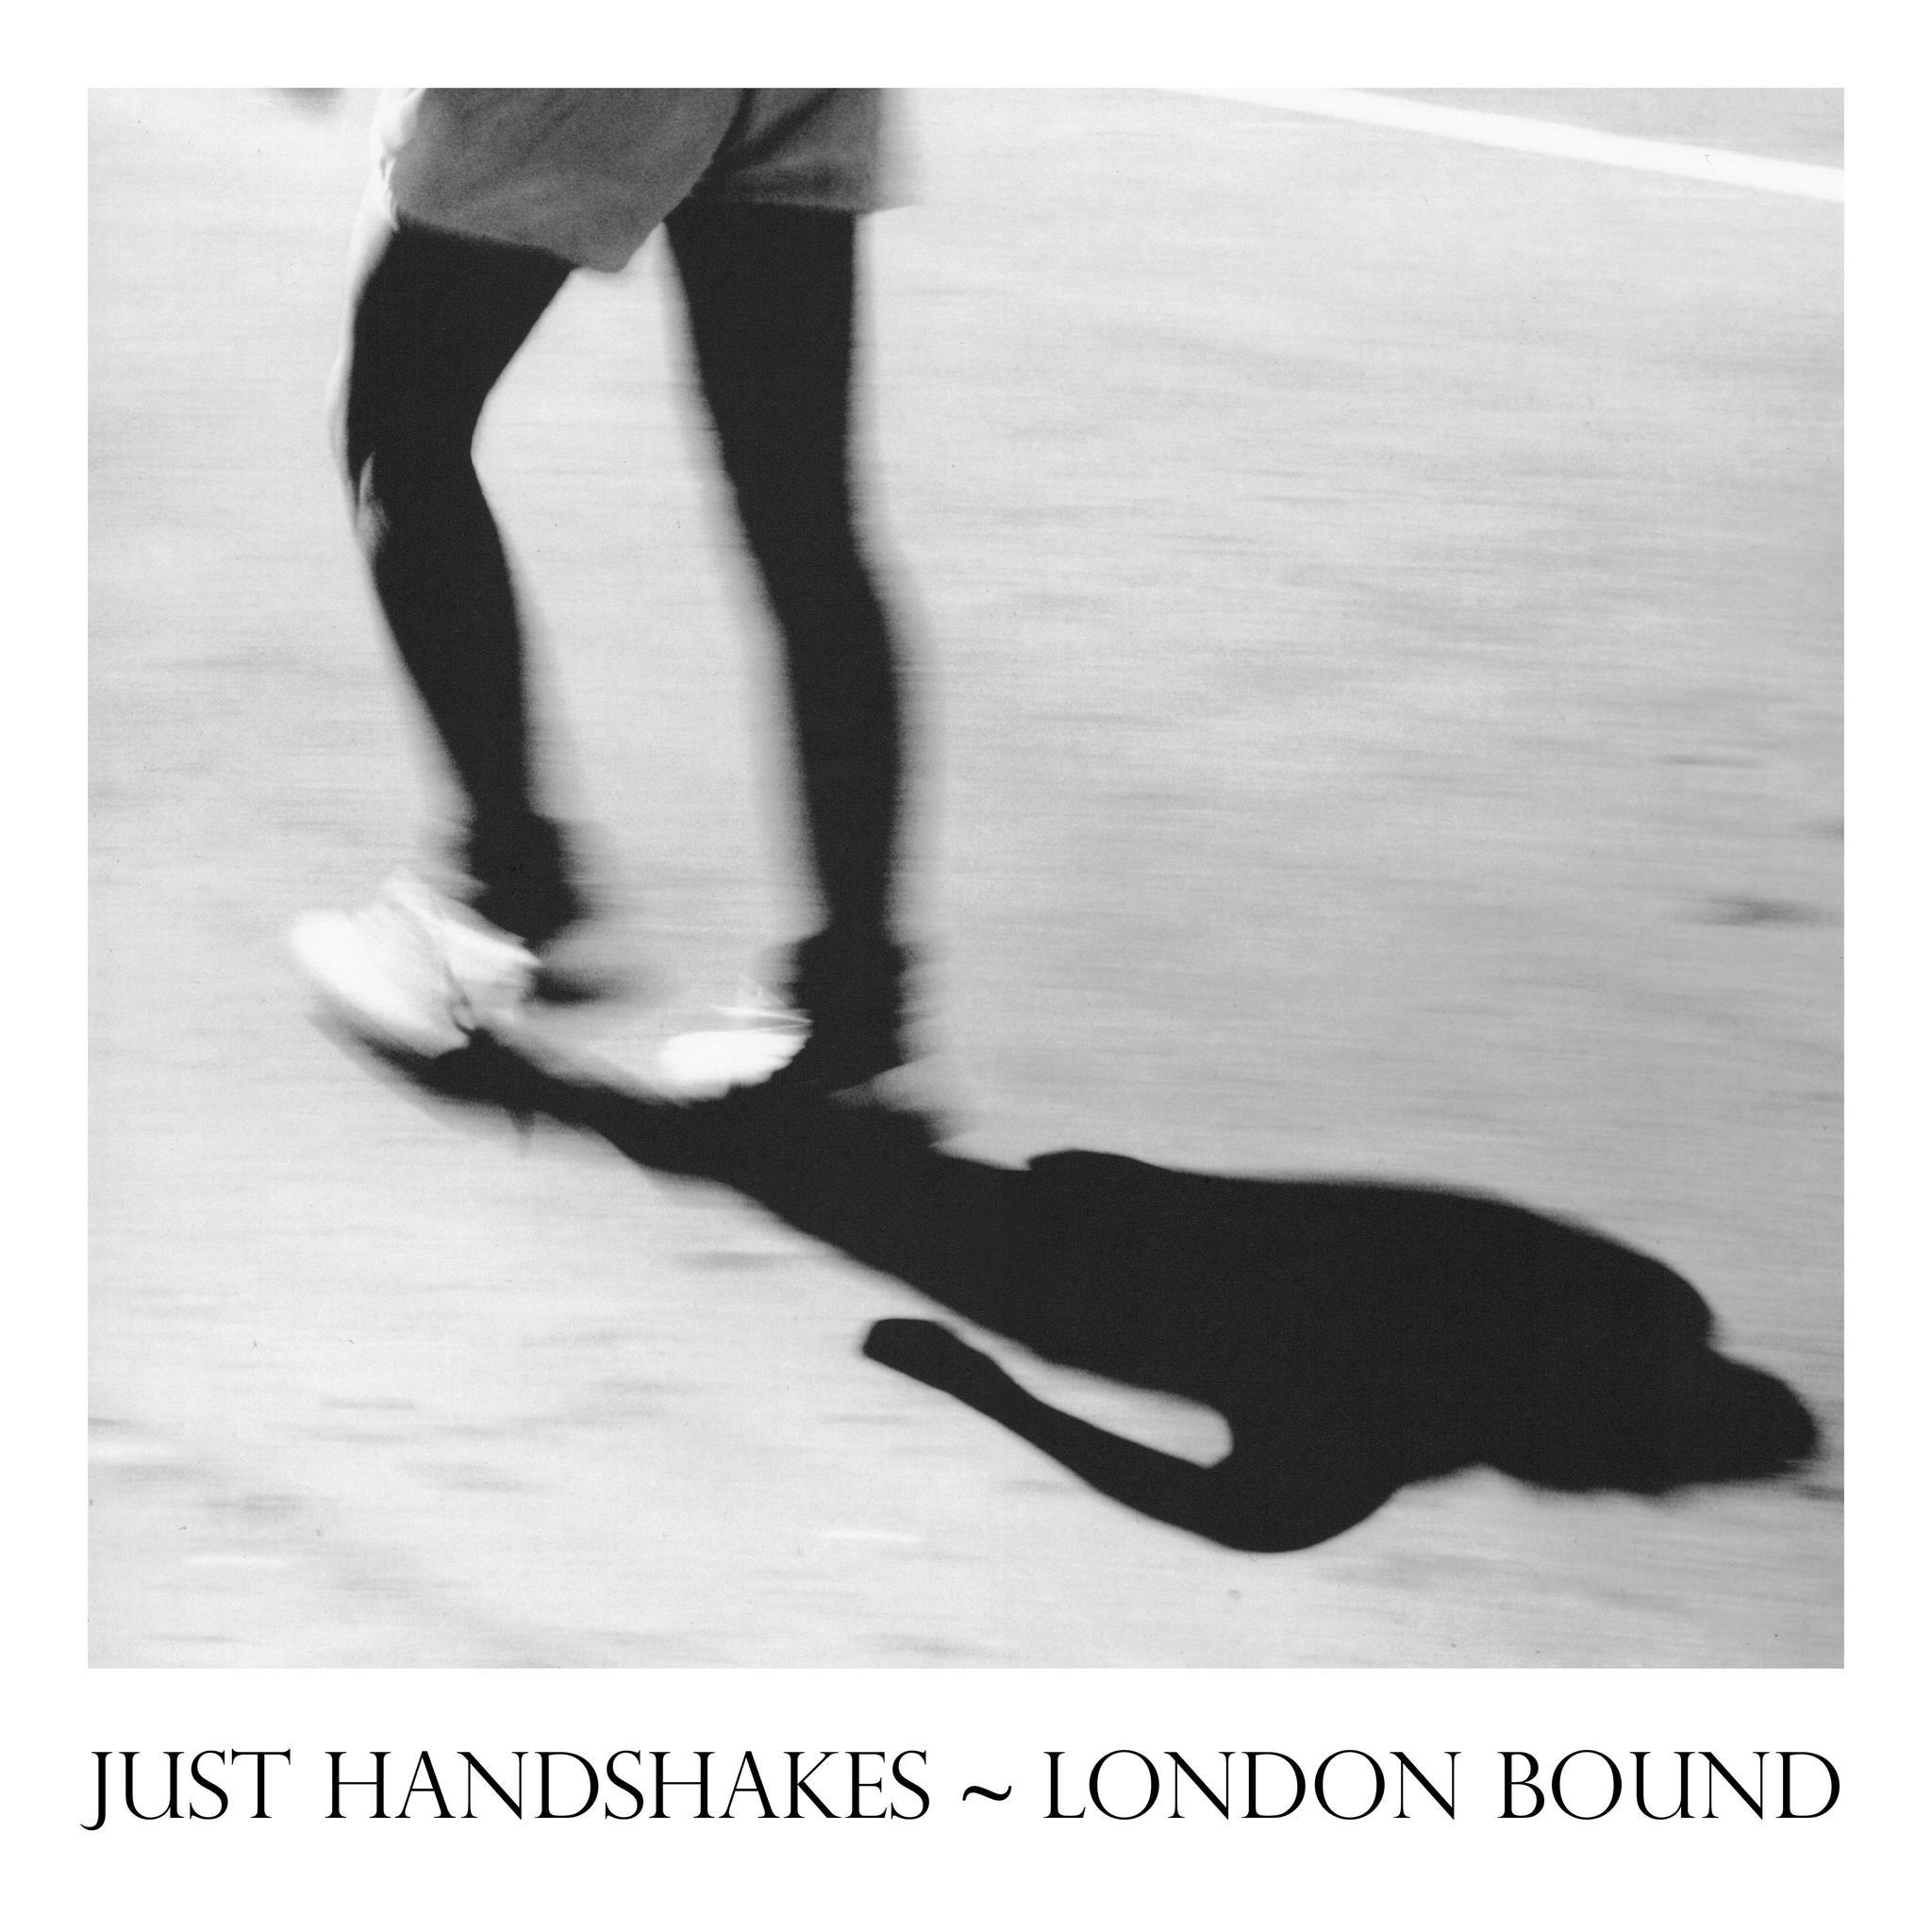 Just Handshakes. London Bound